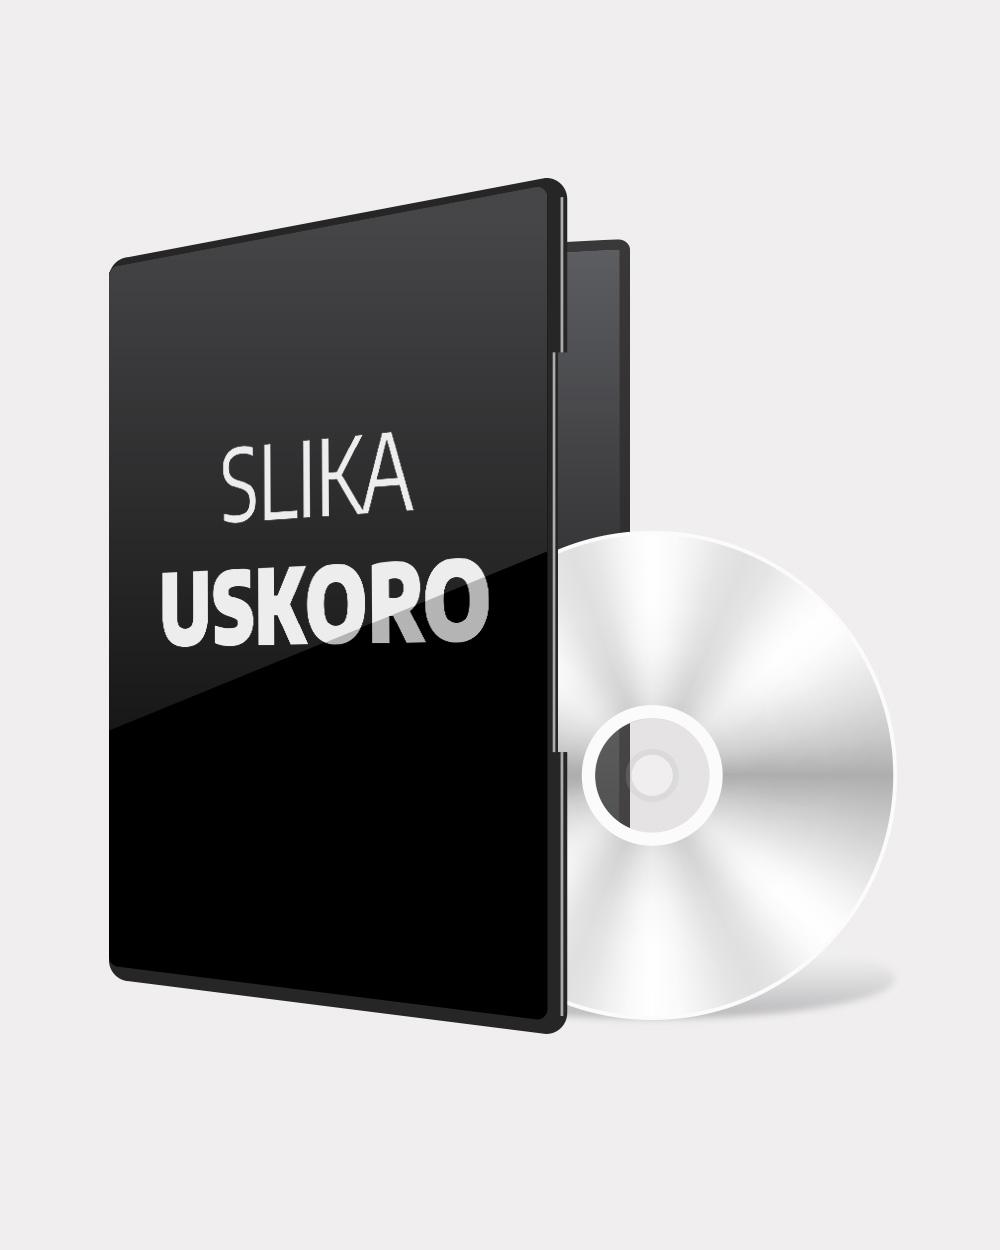 PS3 Avatar